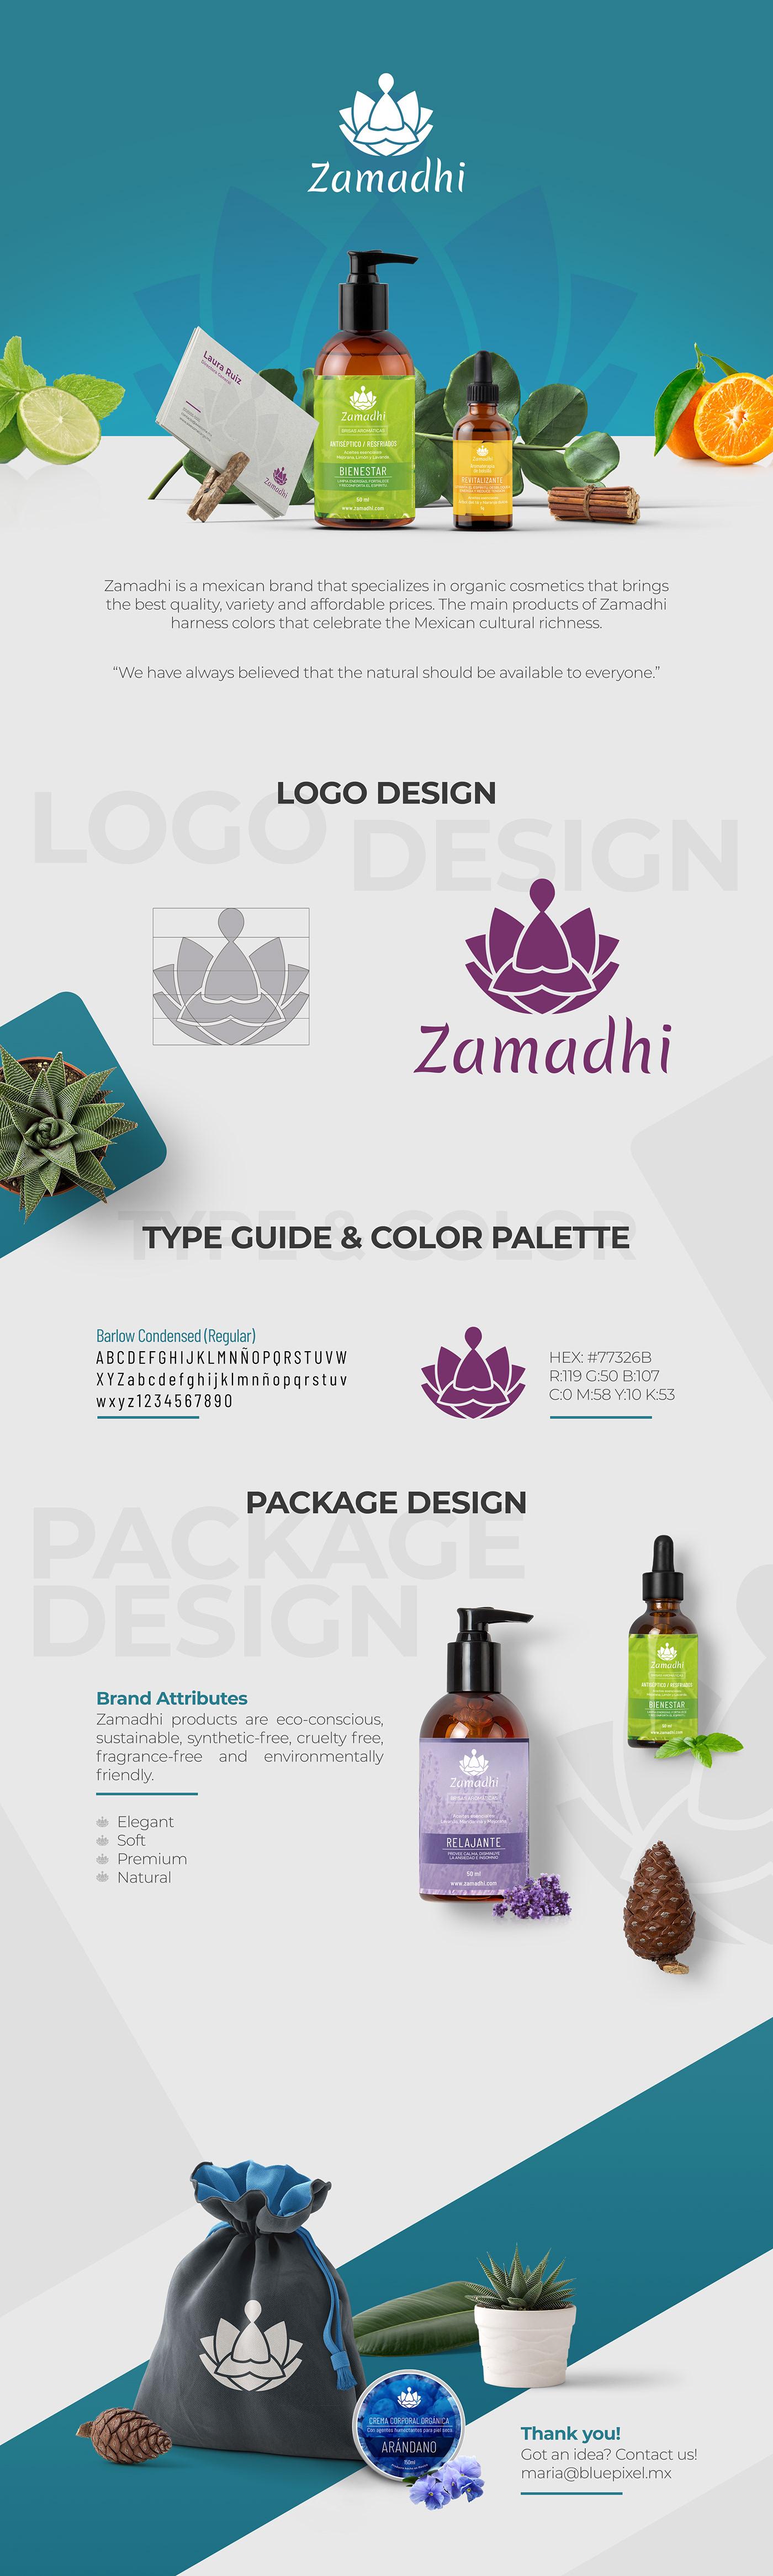 branding  fruits colors brand logo zen natural Mexican diseño gráfico colmetics